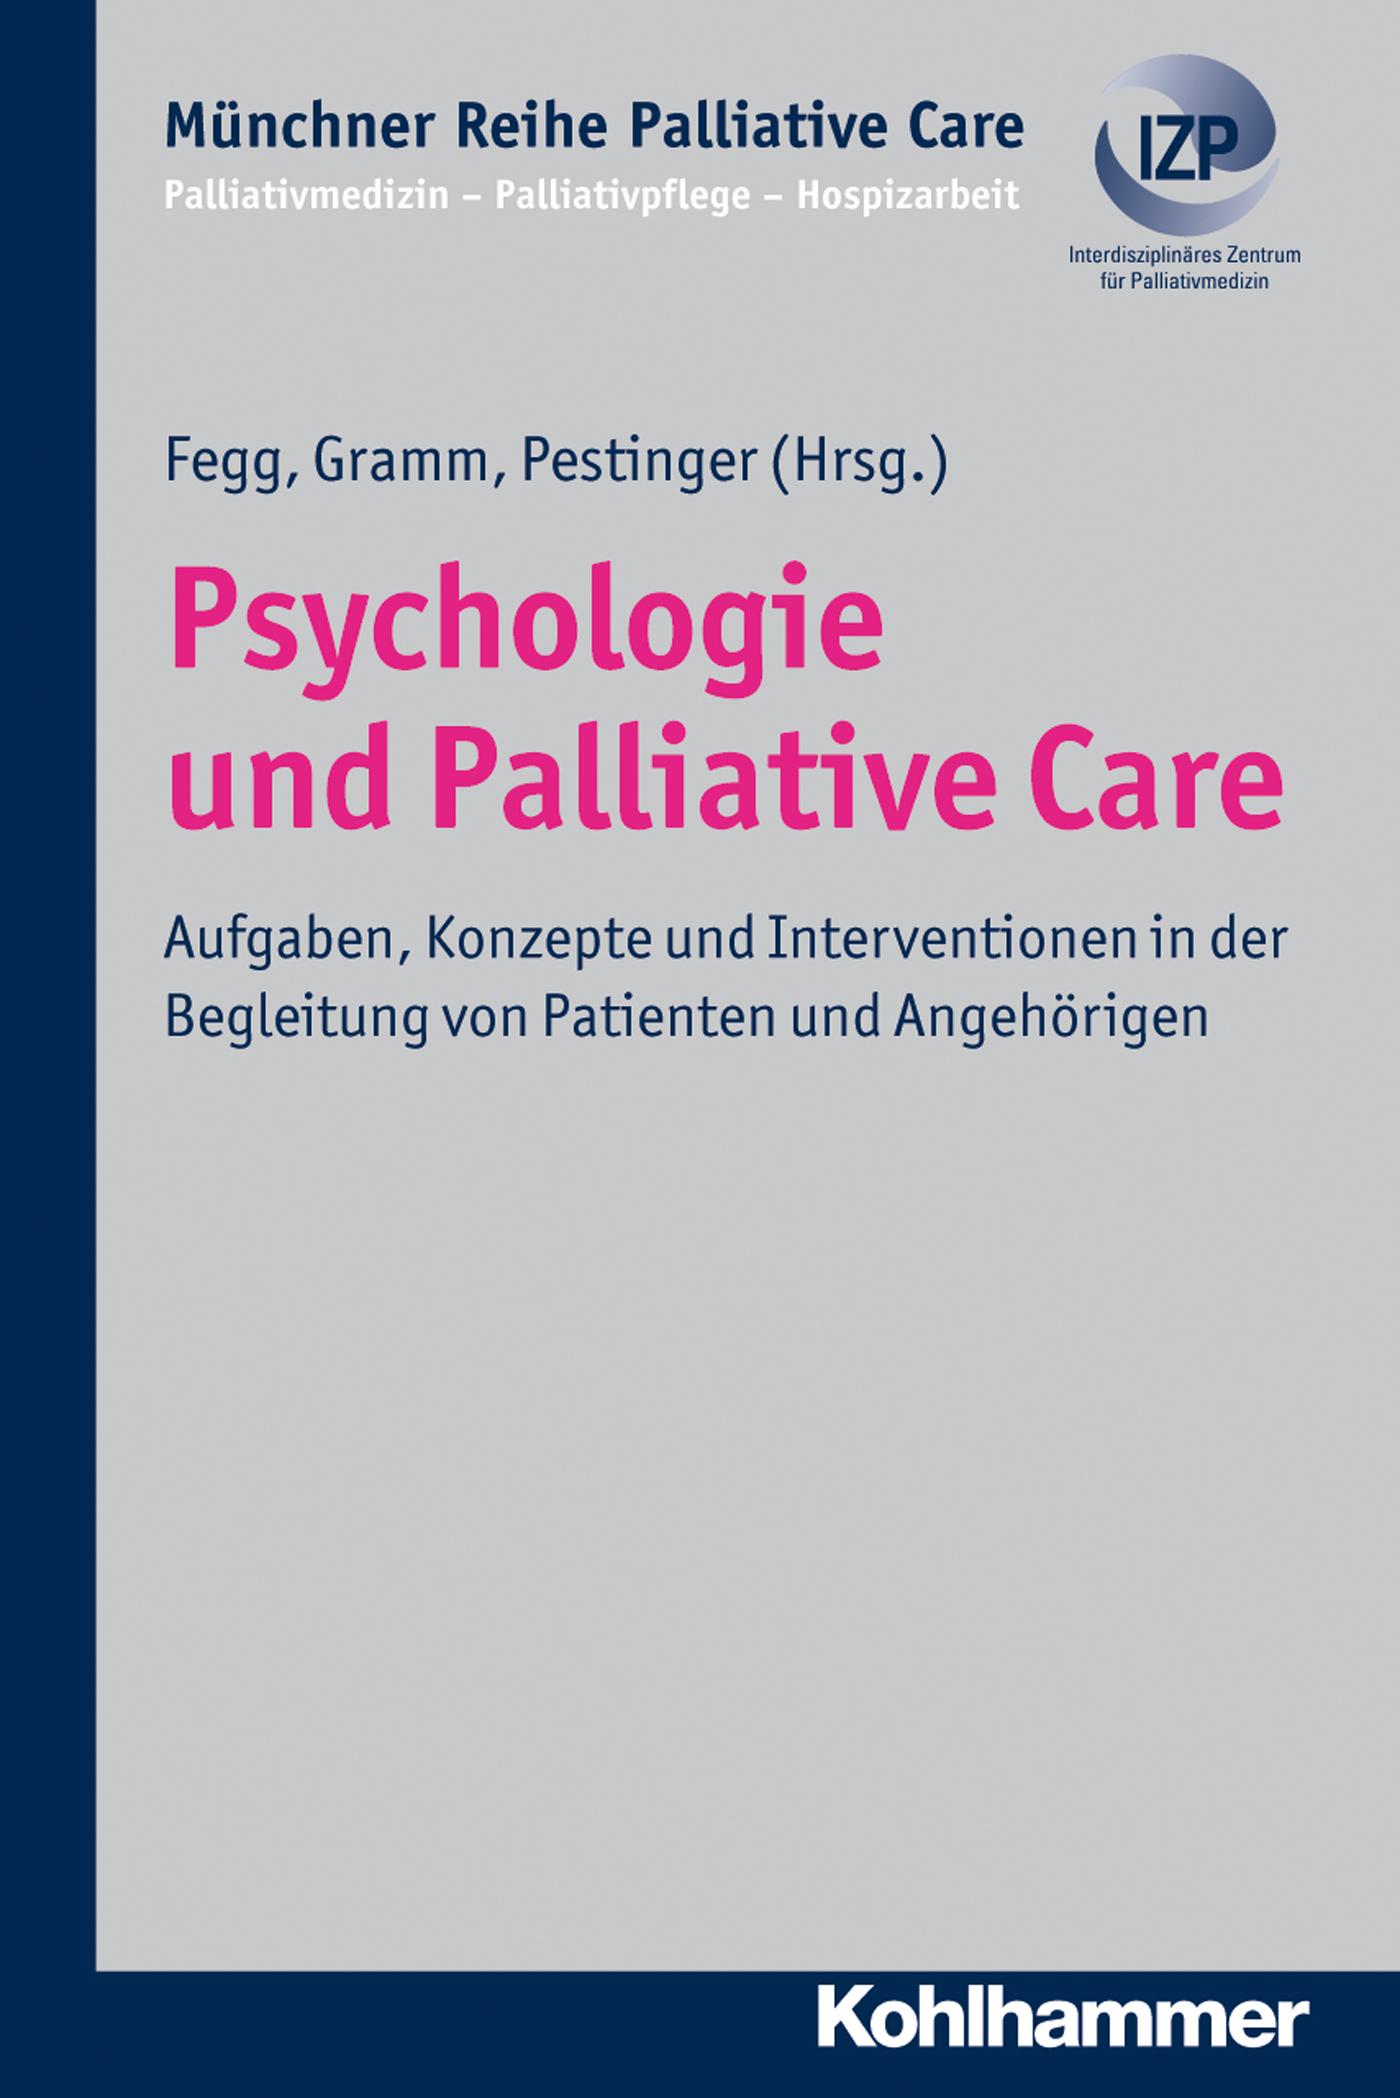 Psychologie und Palliative Care фото